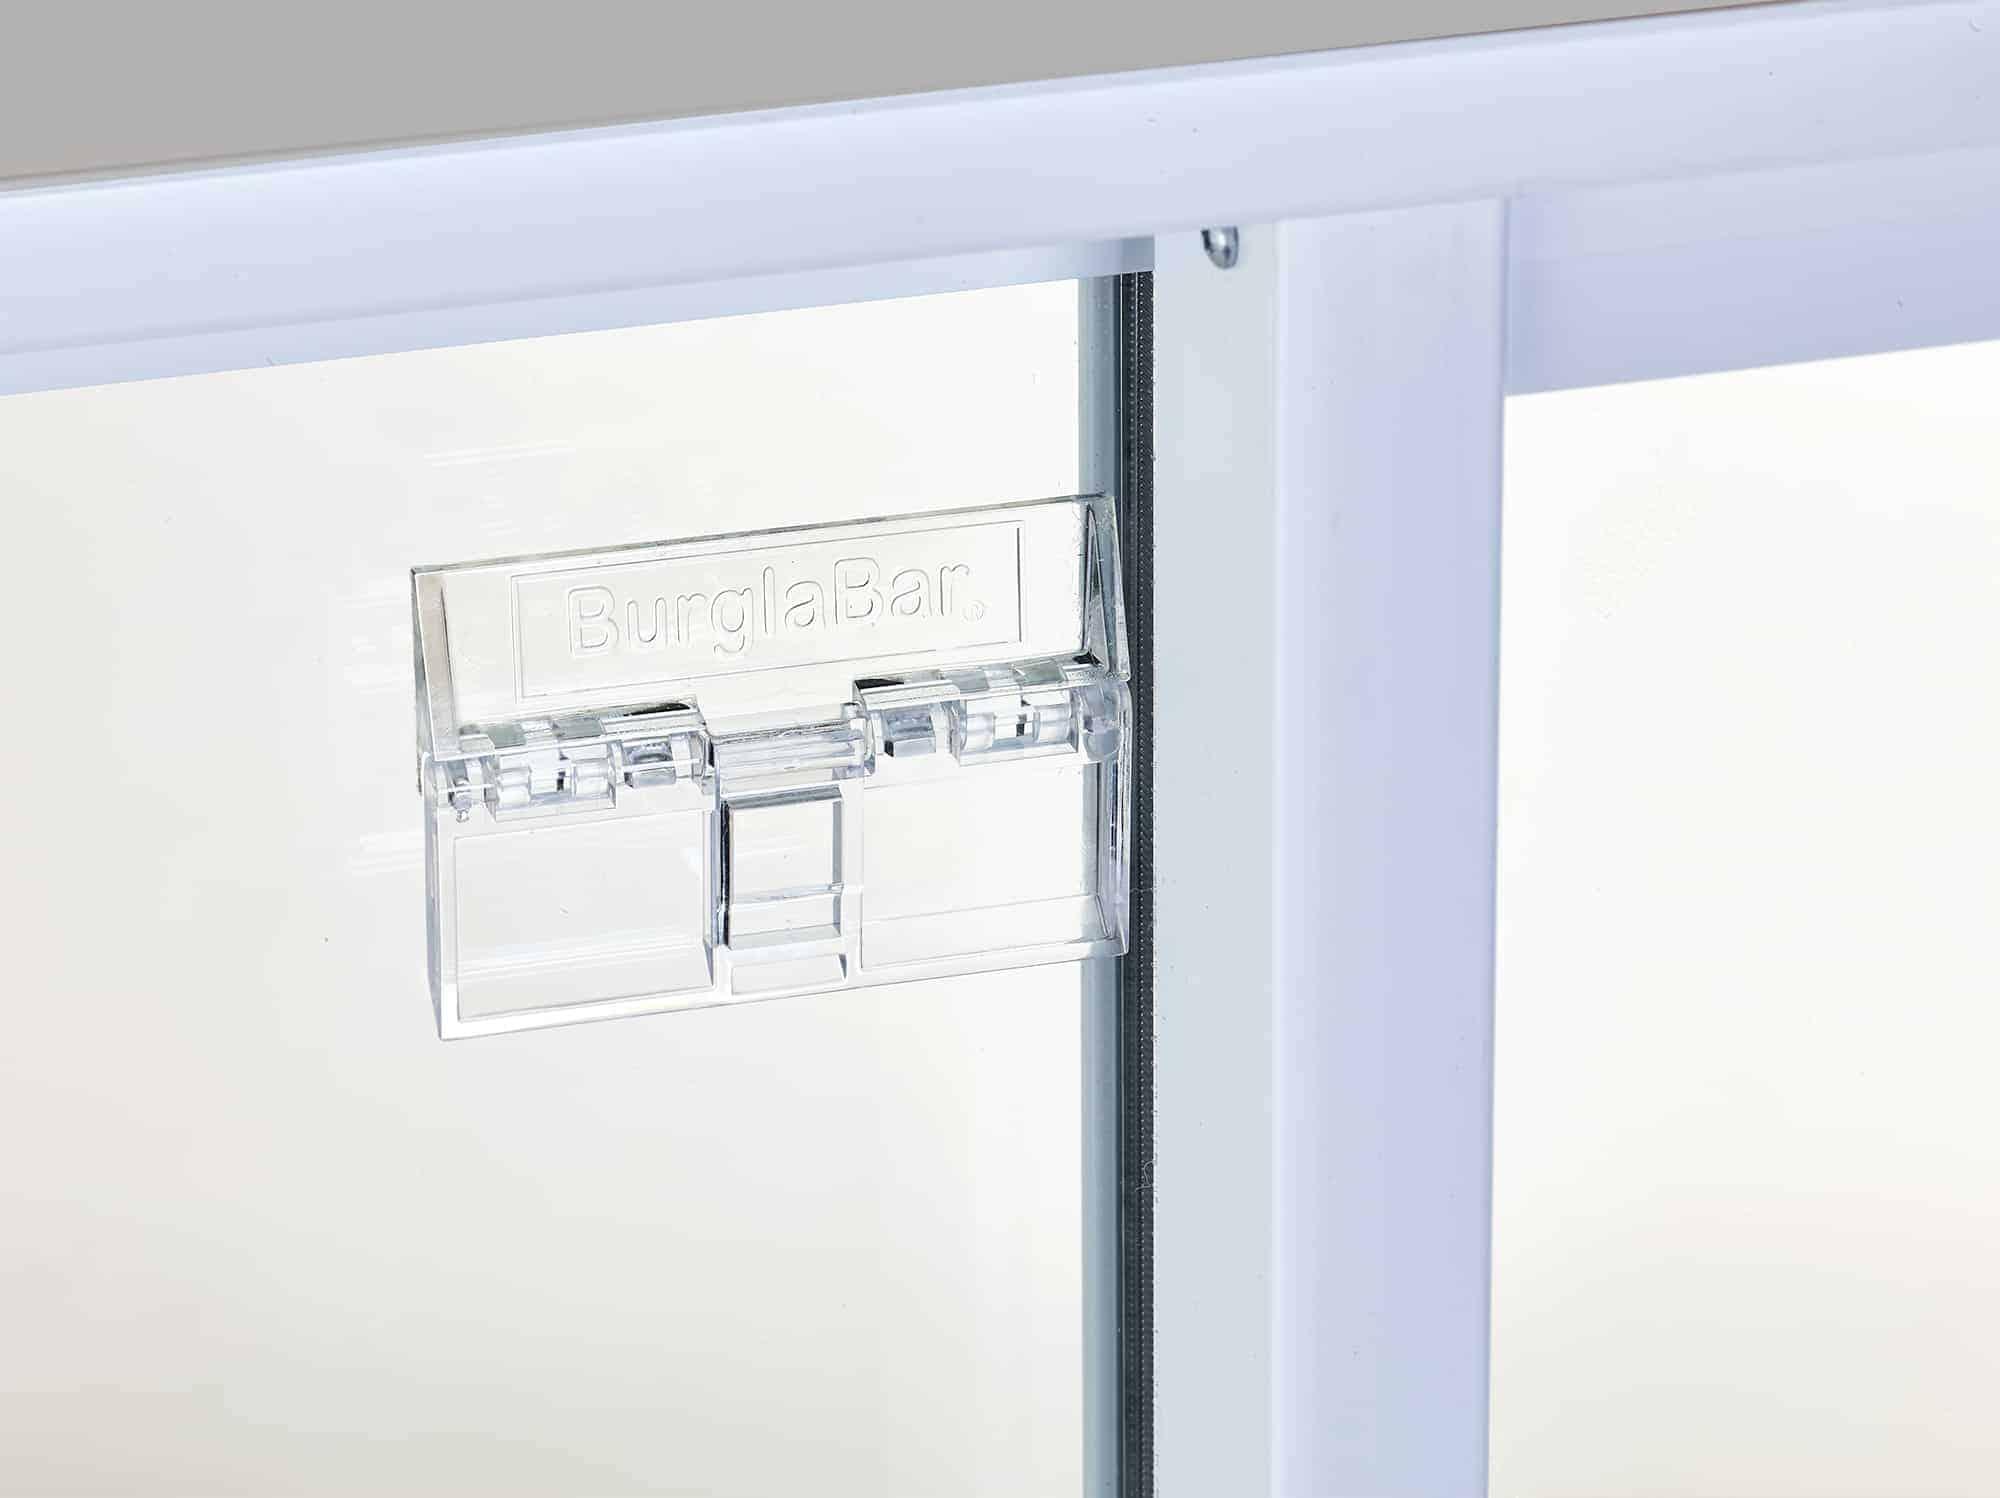 burglabar 4 pack great for sliding patio door lock use 2 for doors sliding window lock sliding basement windows lock child safety lock asin